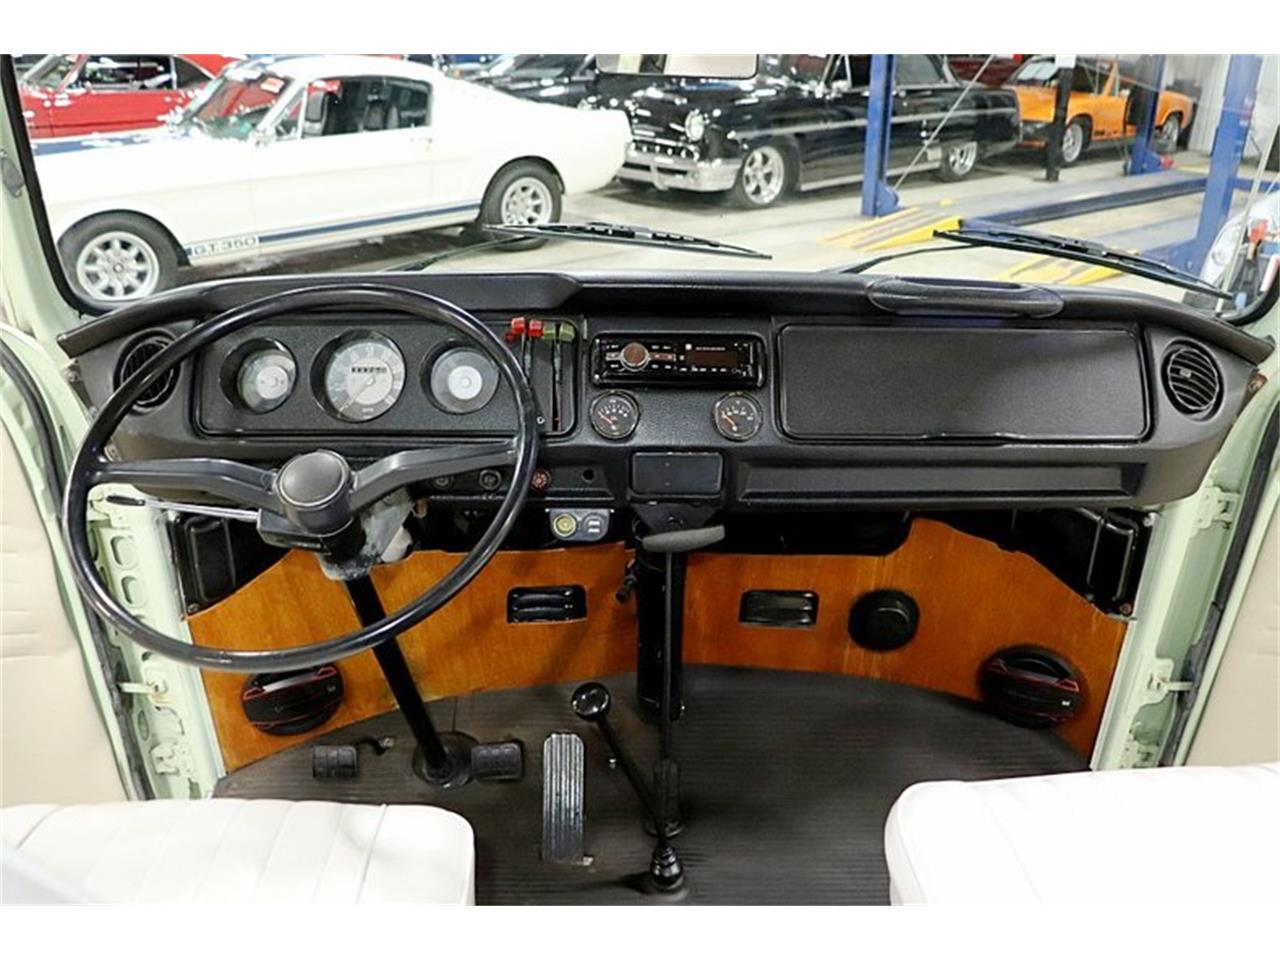 Large Picture of Classic 1969 Volkswagen Westfalia Camper located in Michigan - $26,900.00 - Q5WZ